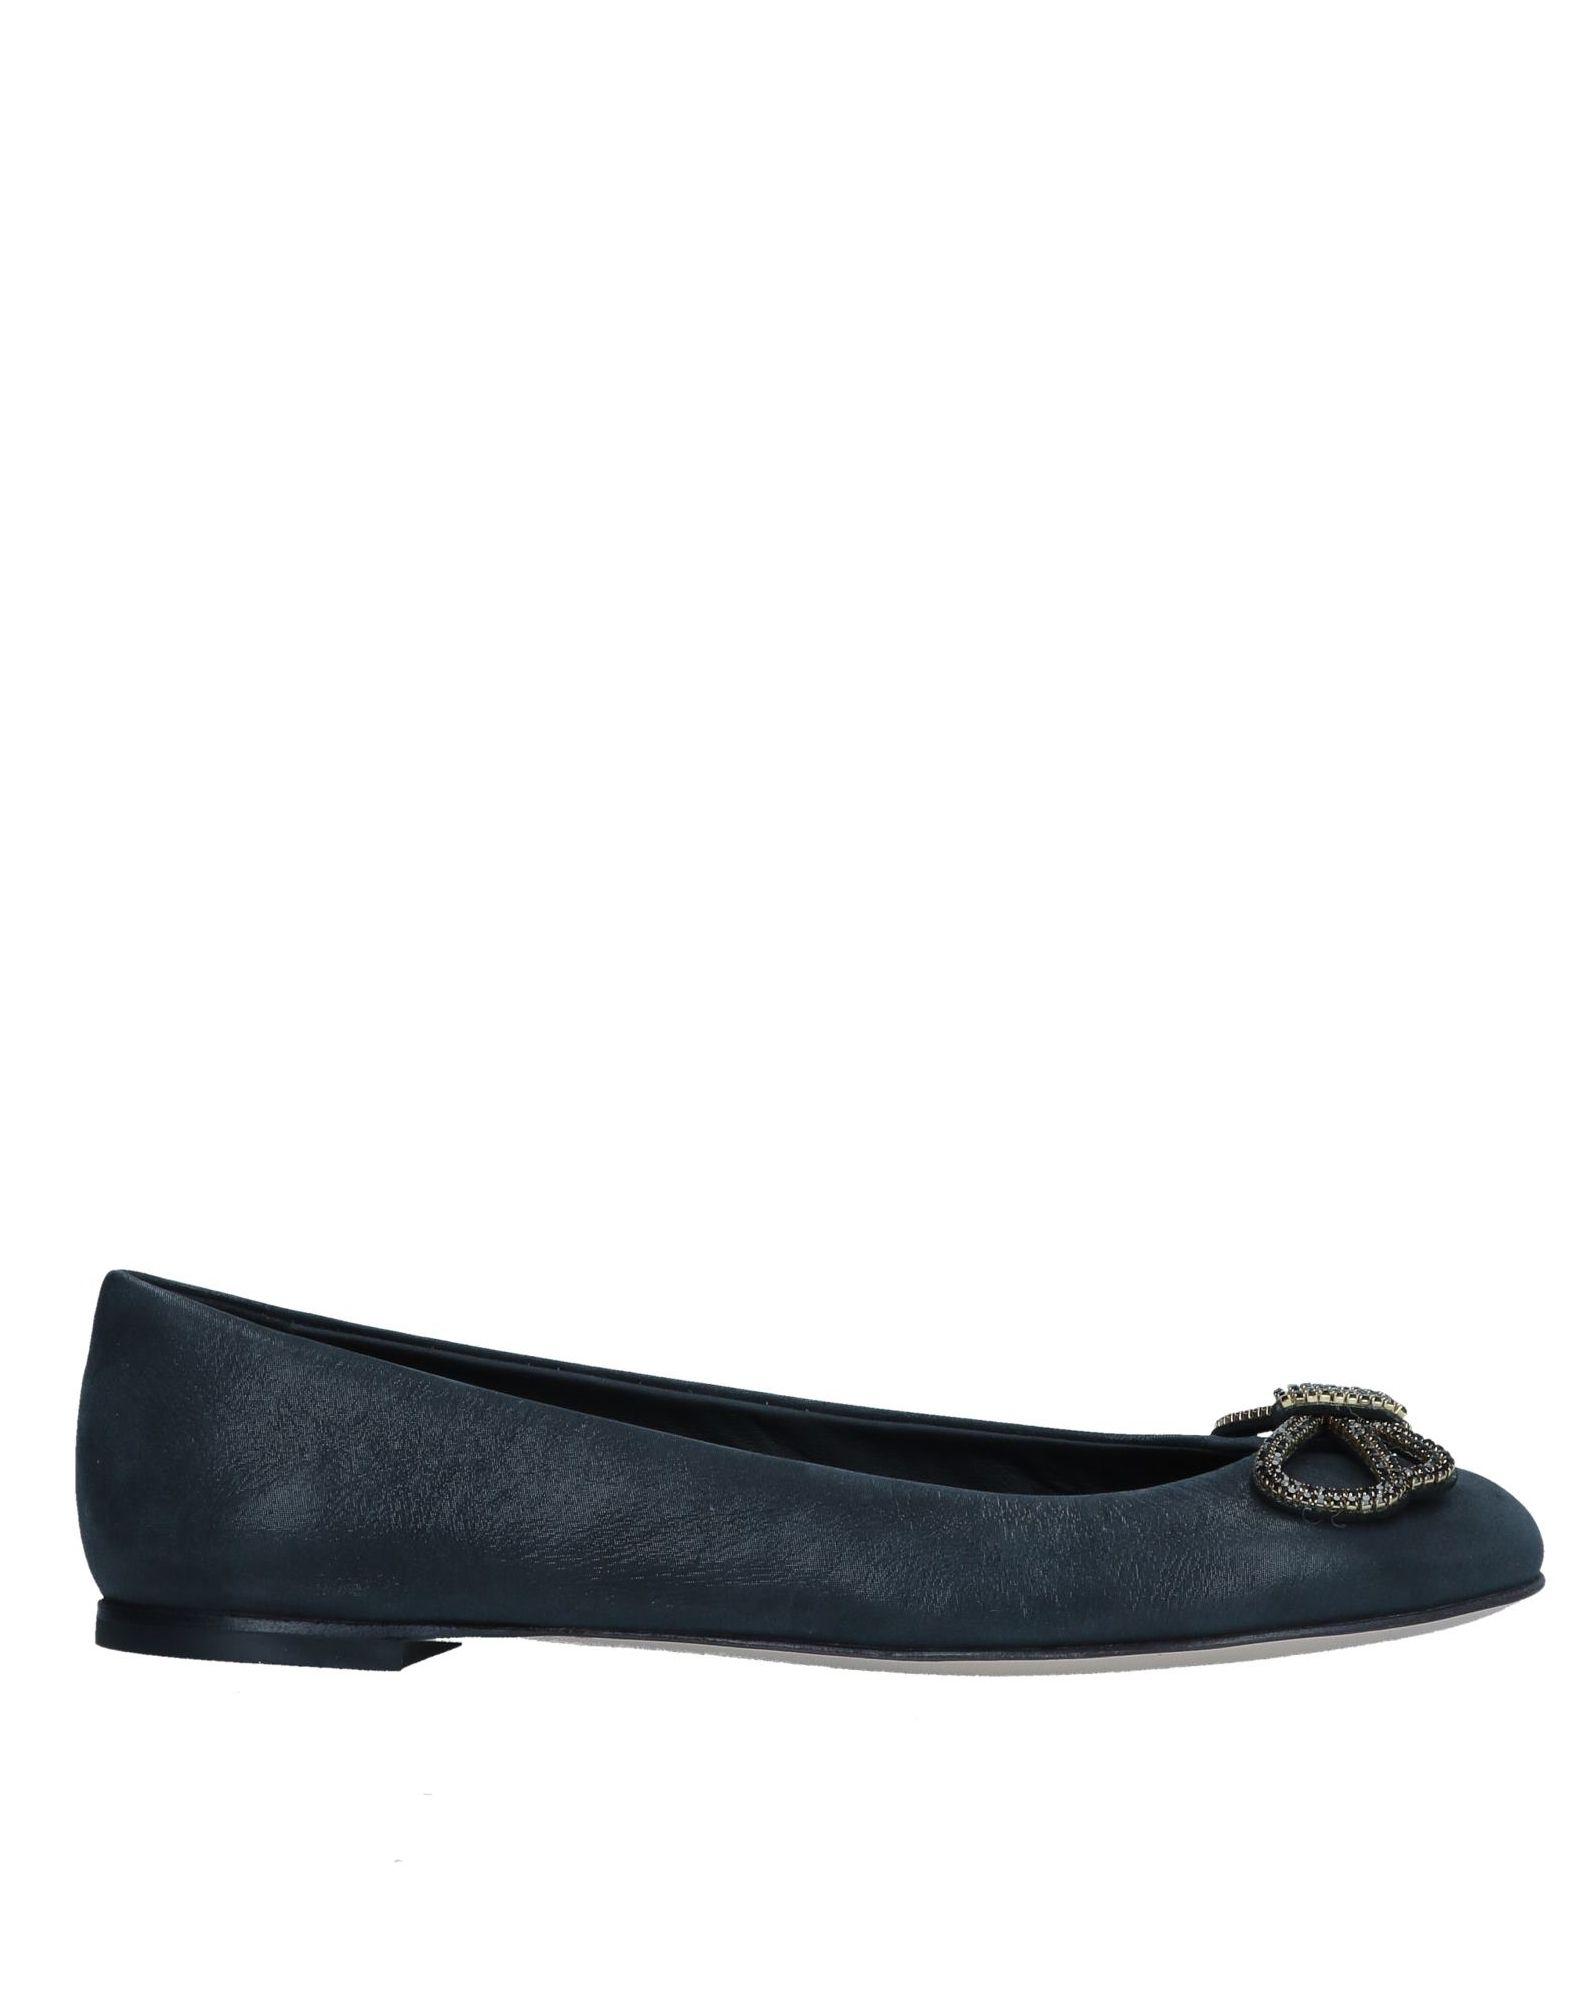 Rabatt Schuhe Giuseppe Zanotti Ballerinas Damen  11545549MQ